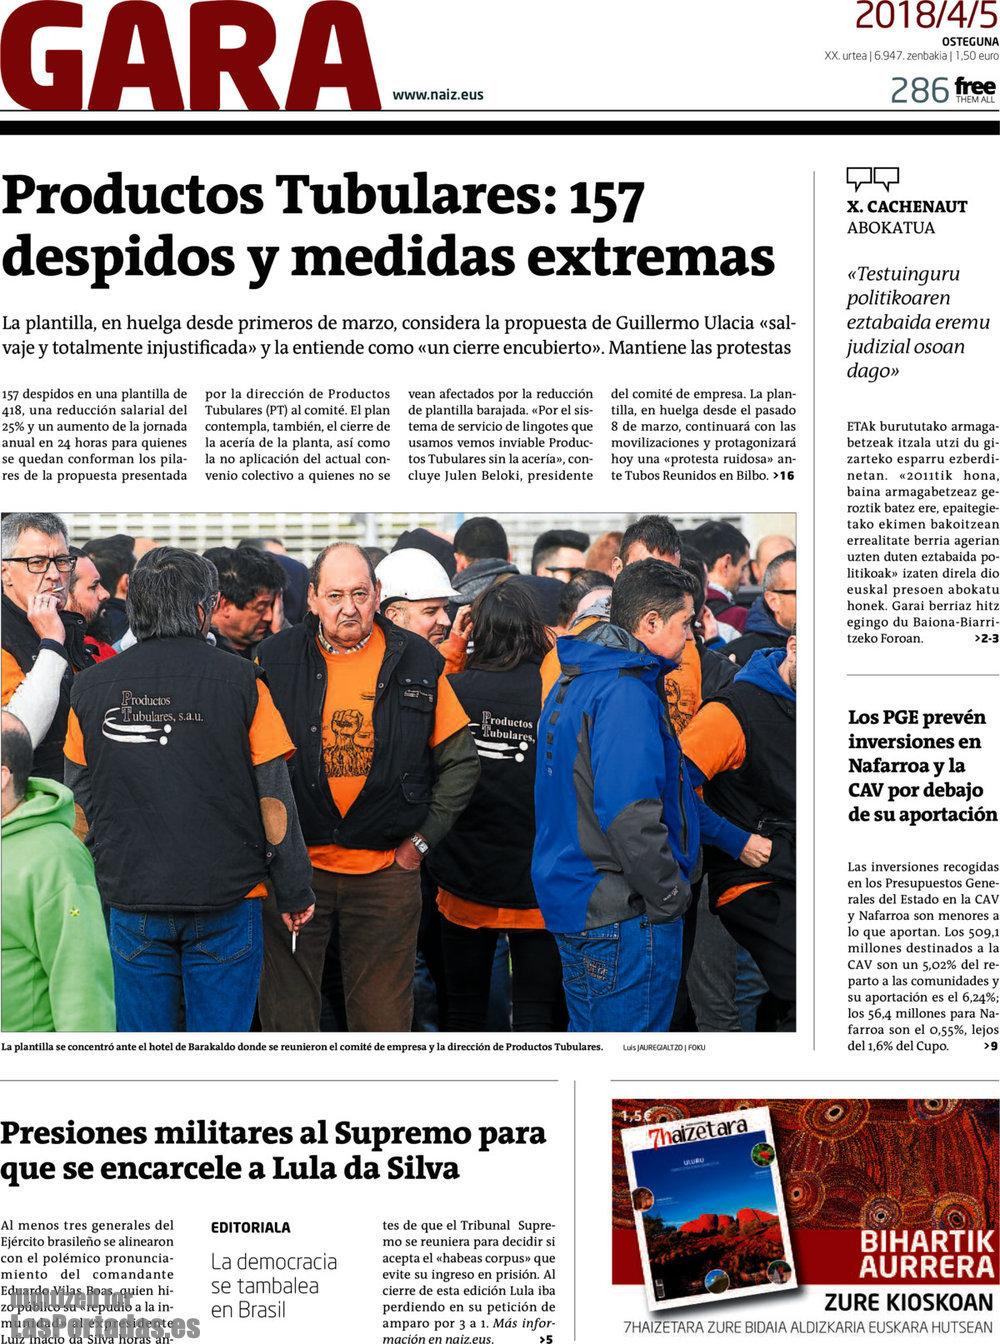 Periodico Gara - 5/4/2018